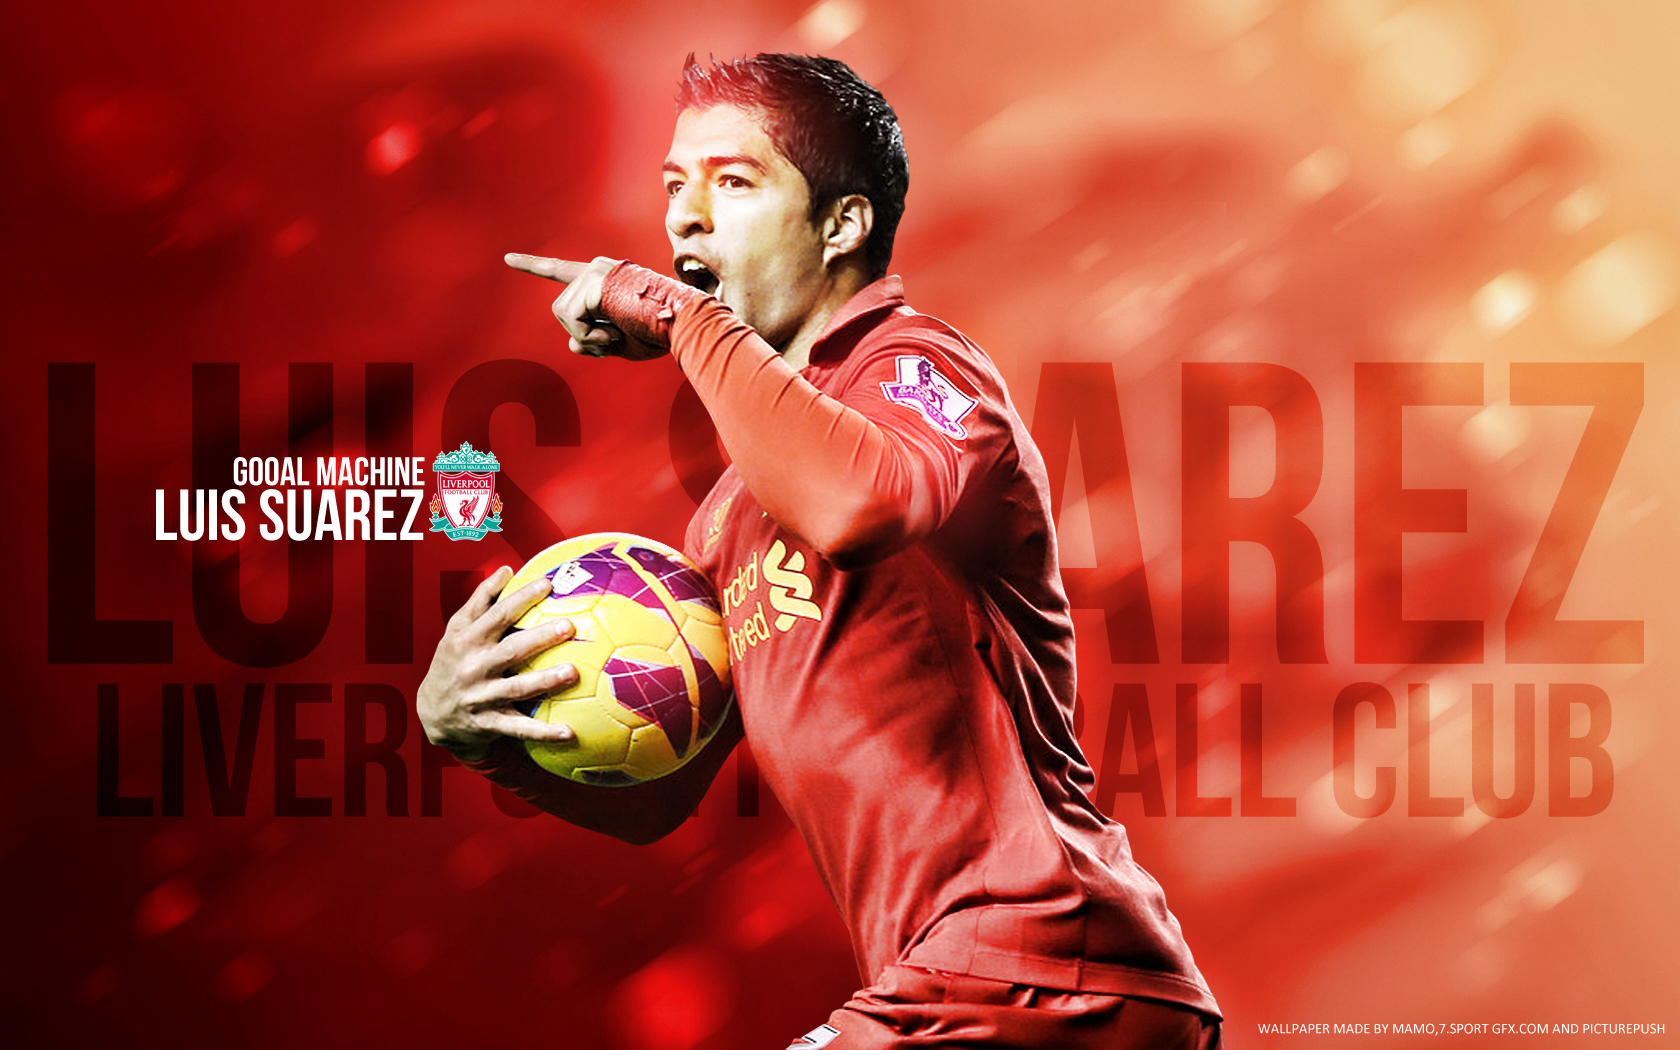 Luis Suarez Wallpaper   Football Wallpaper HD Football Picture HD 1680x1050